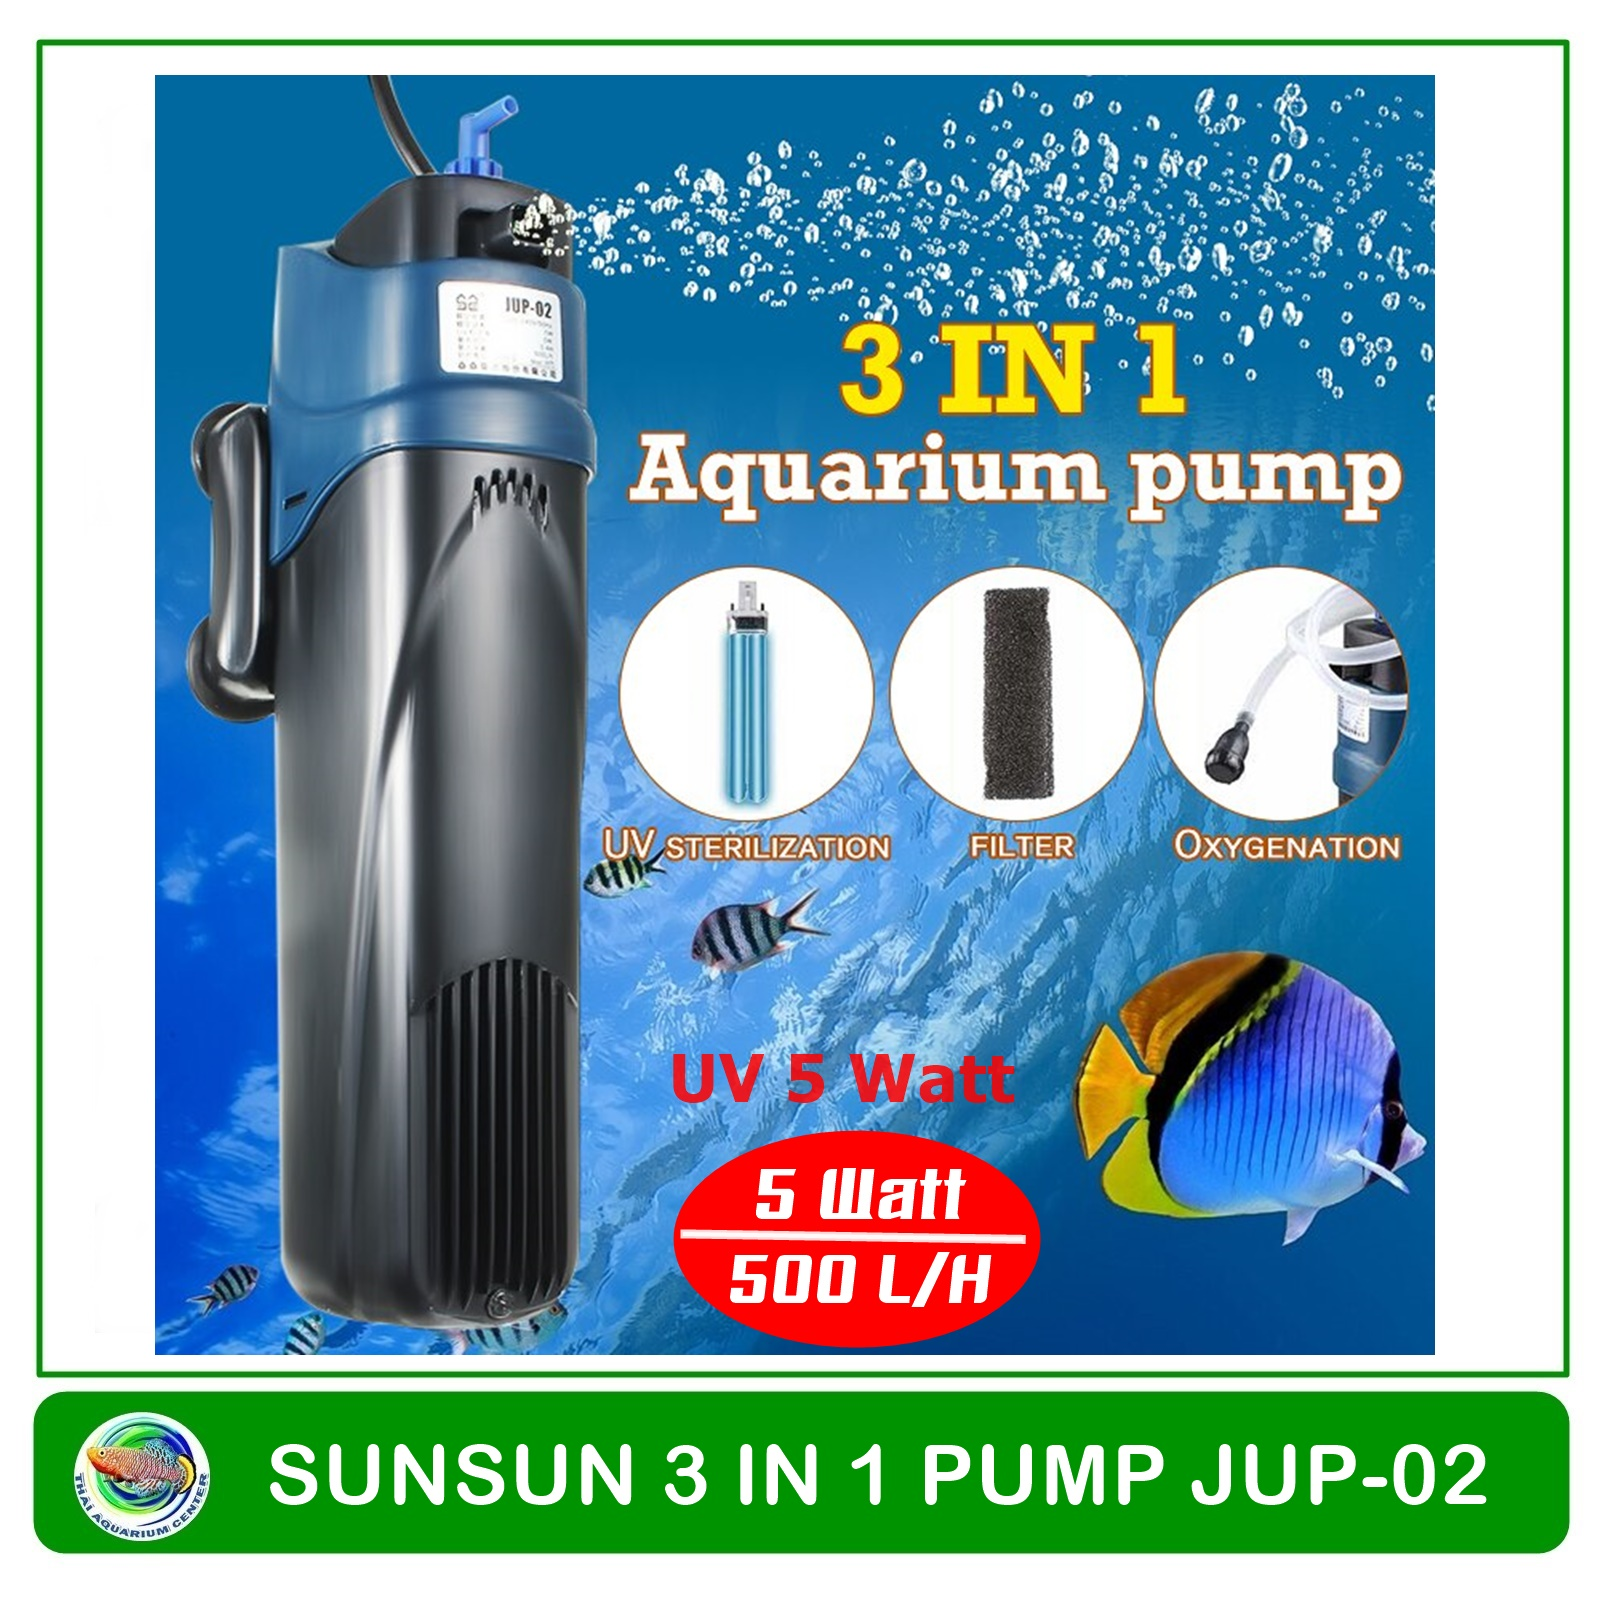 SUNSUN Filtration Pump JUP-02 UV 5 Wattปั้มน้ำพร้อมระบบกรองและหลอด UV ฆ่าเชื้อโรค